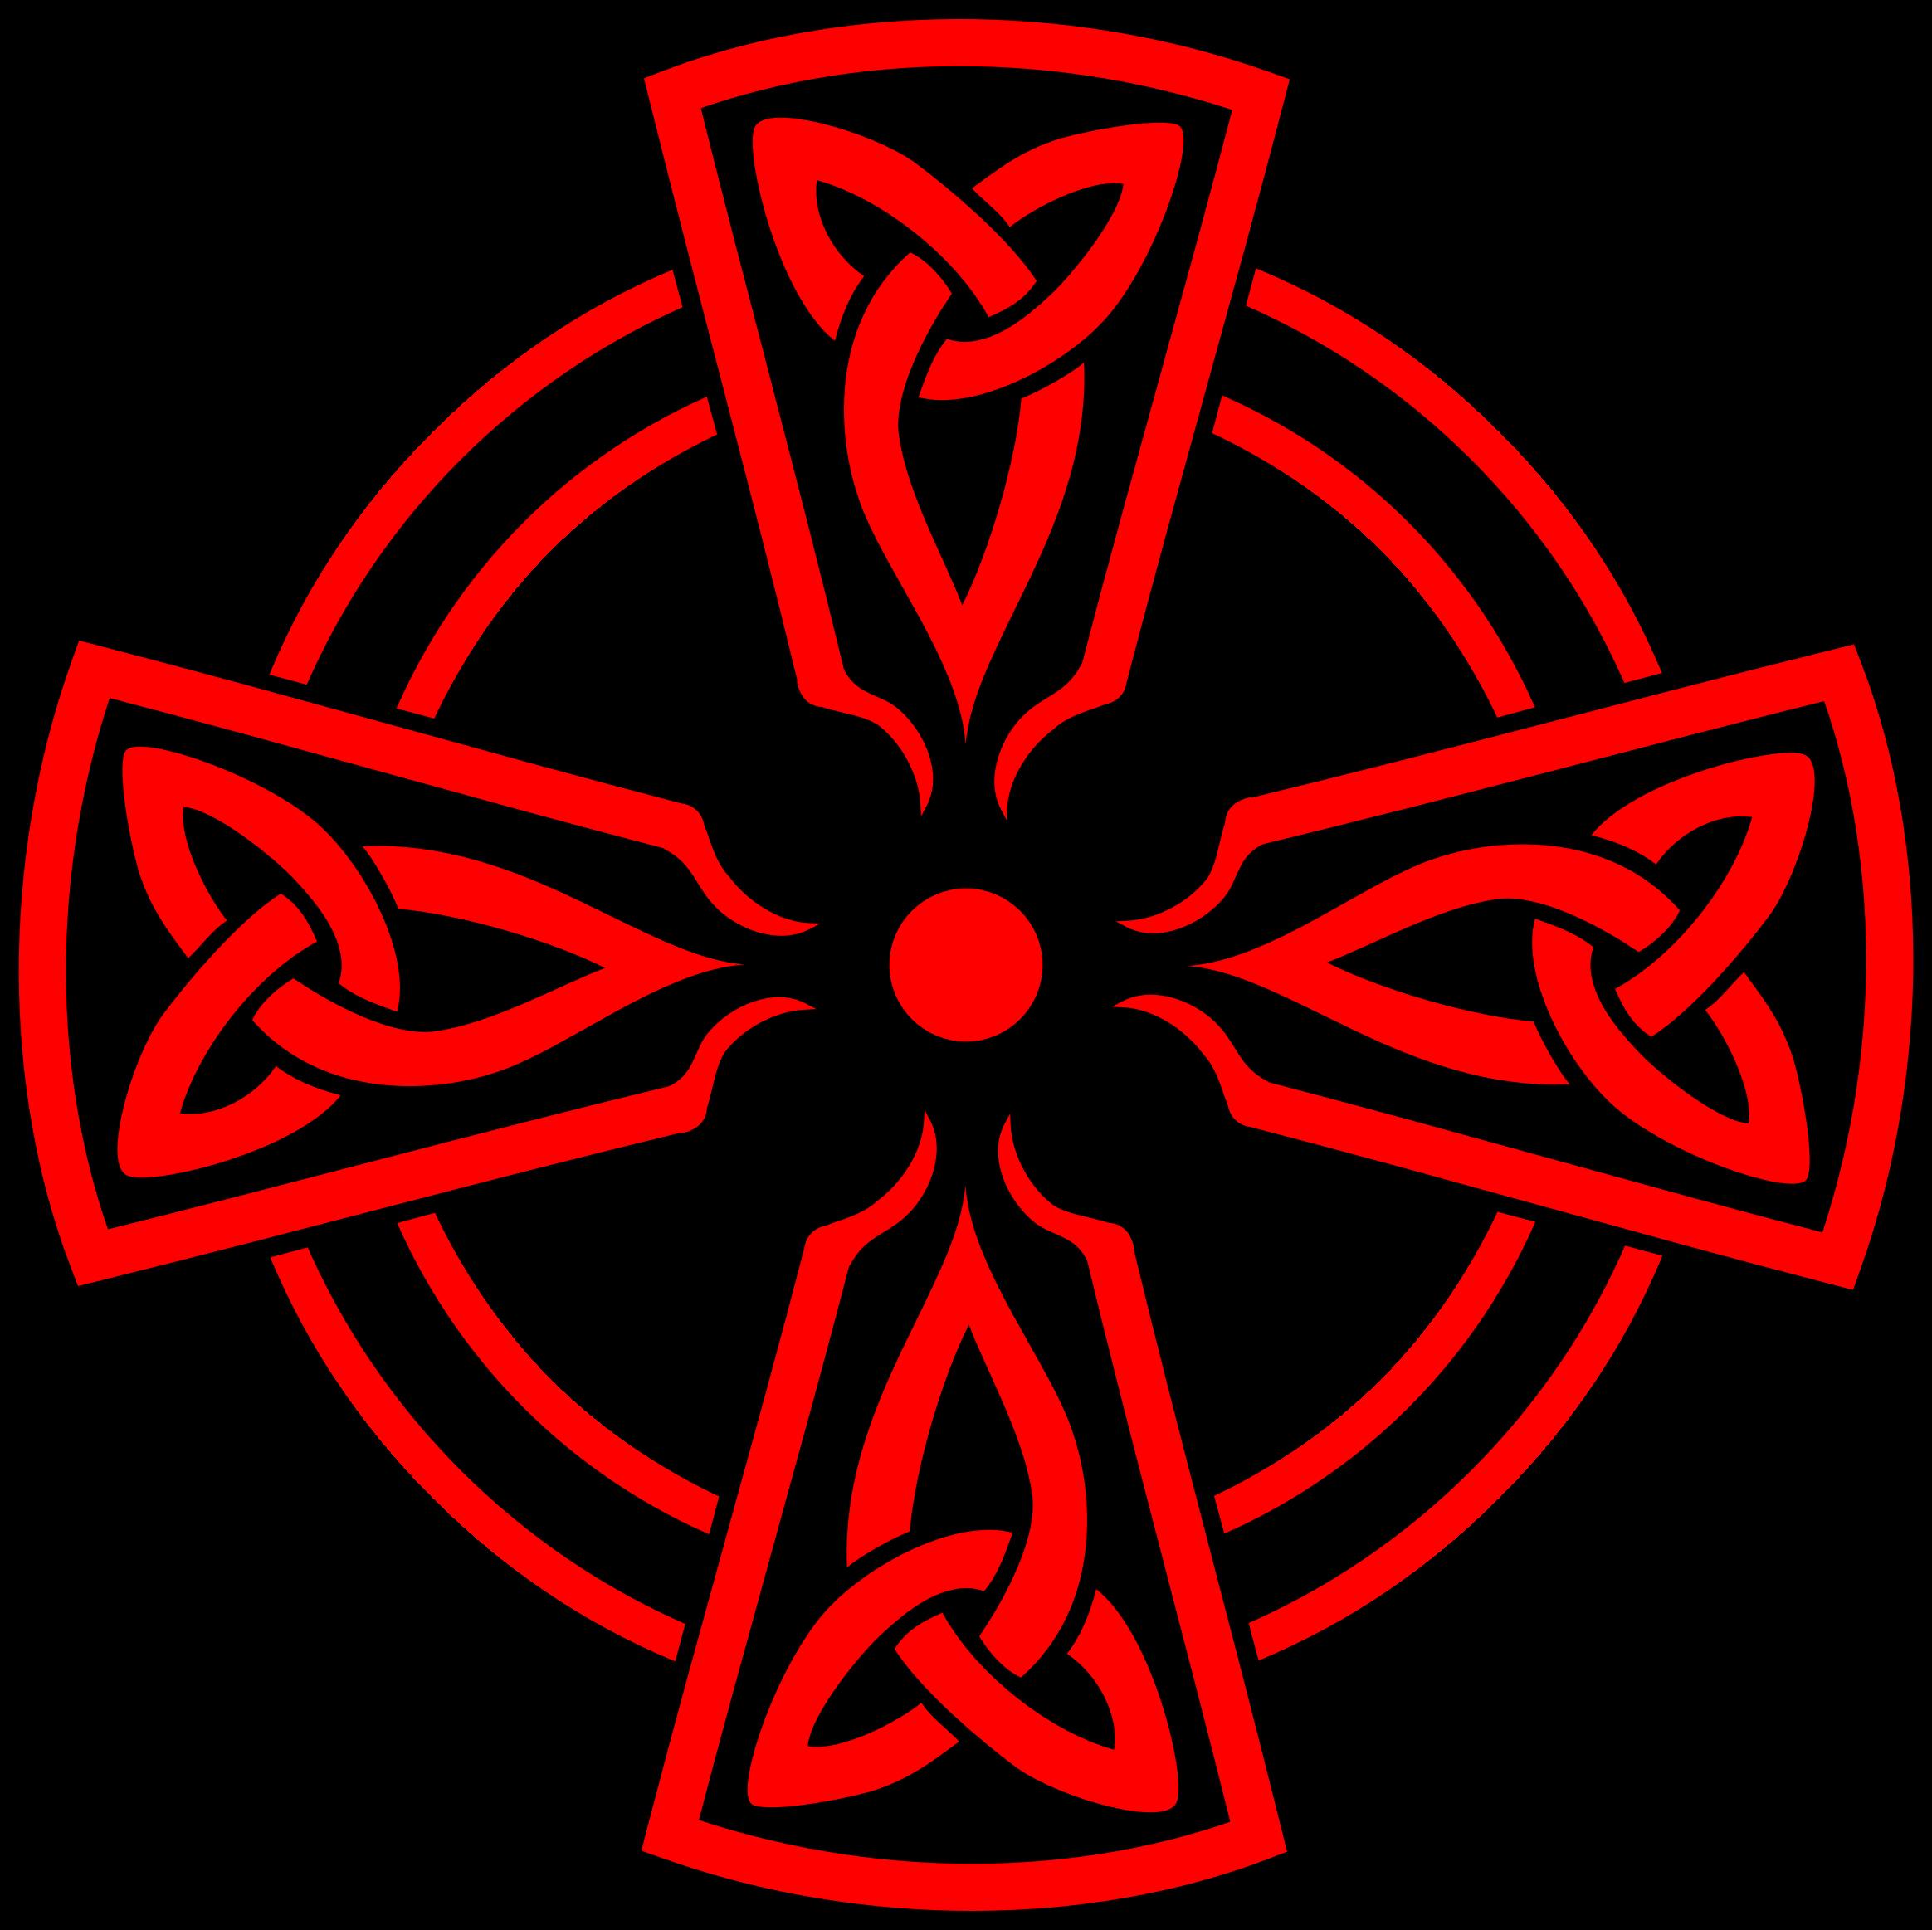 Irish cross clipart svg freeuse Clipart - Celtic Cross DecorativeTriquetras Red svg freeuse